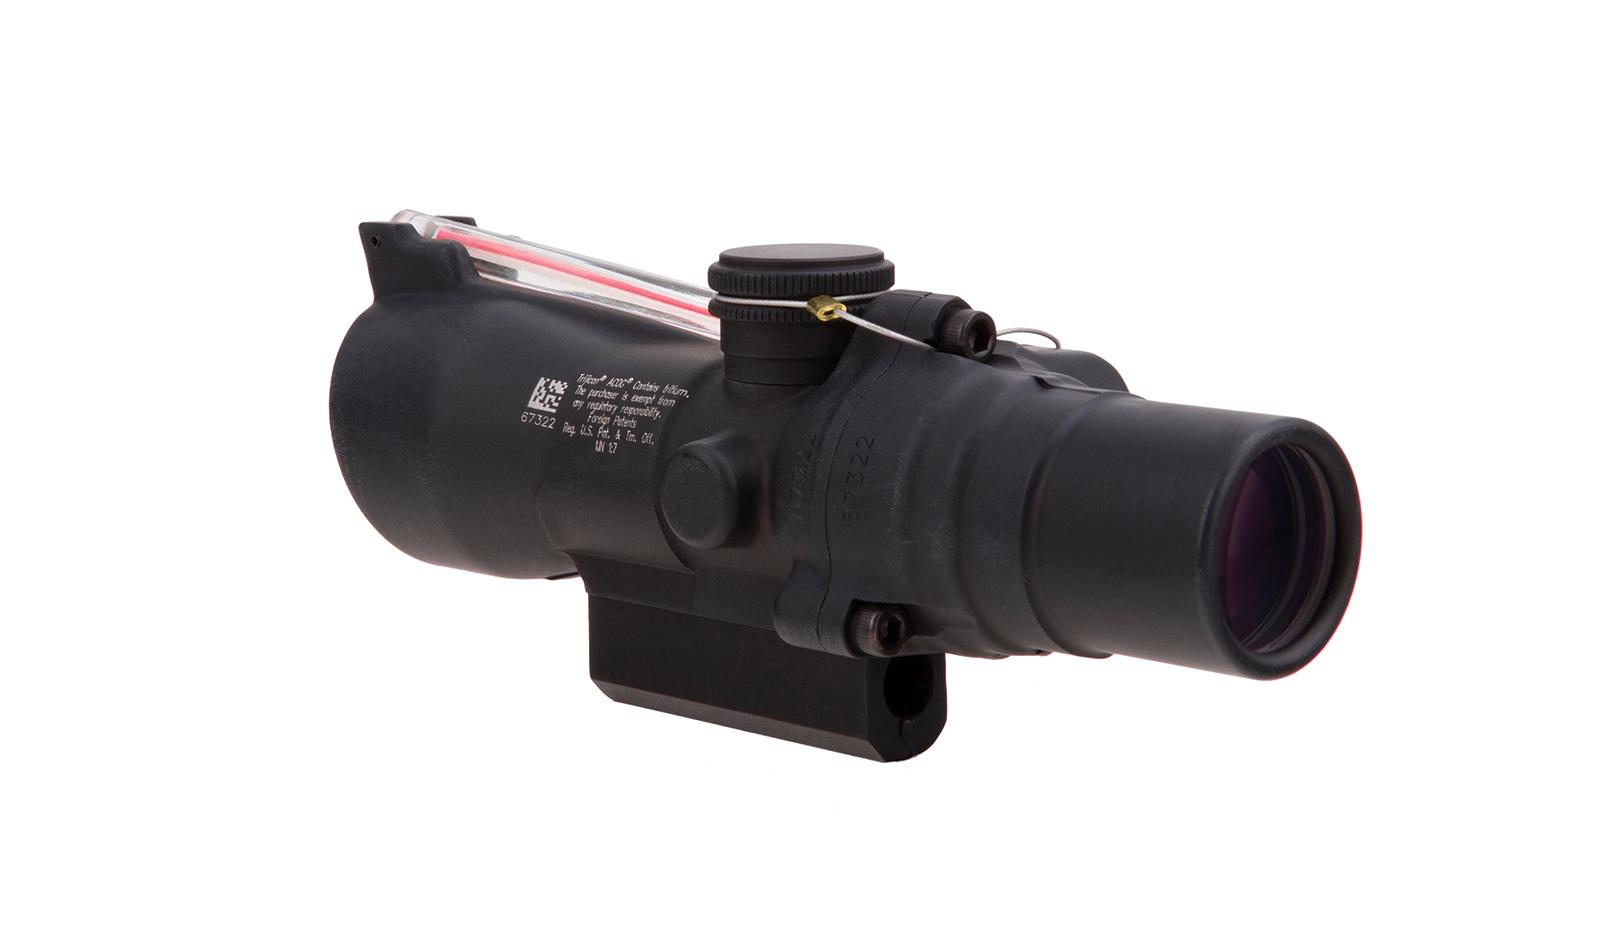 TA47-C-400150 angle 3